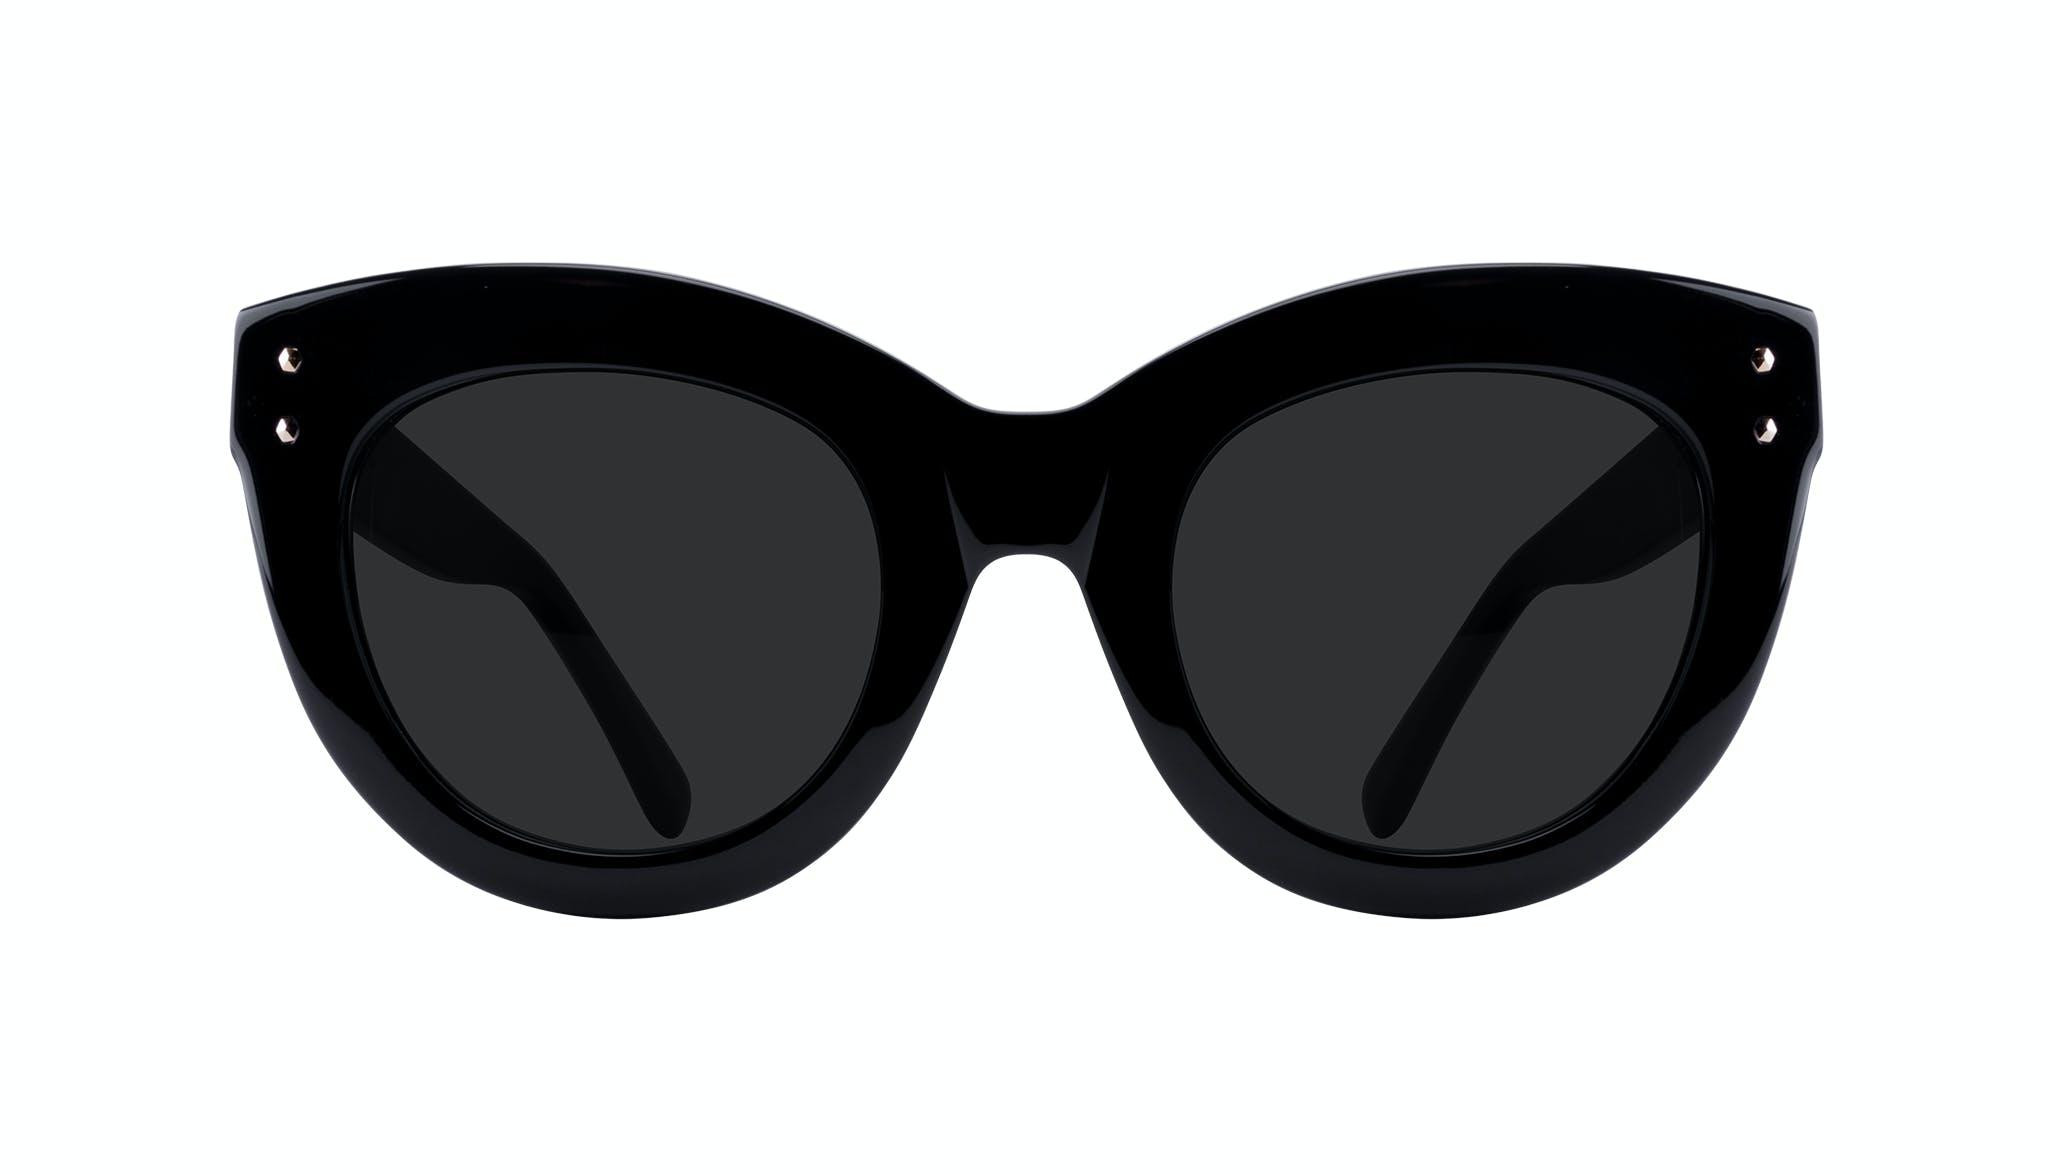 Affordable Fashion Glasses Cat Eye Sunglasses Women Dusk Onyx Front